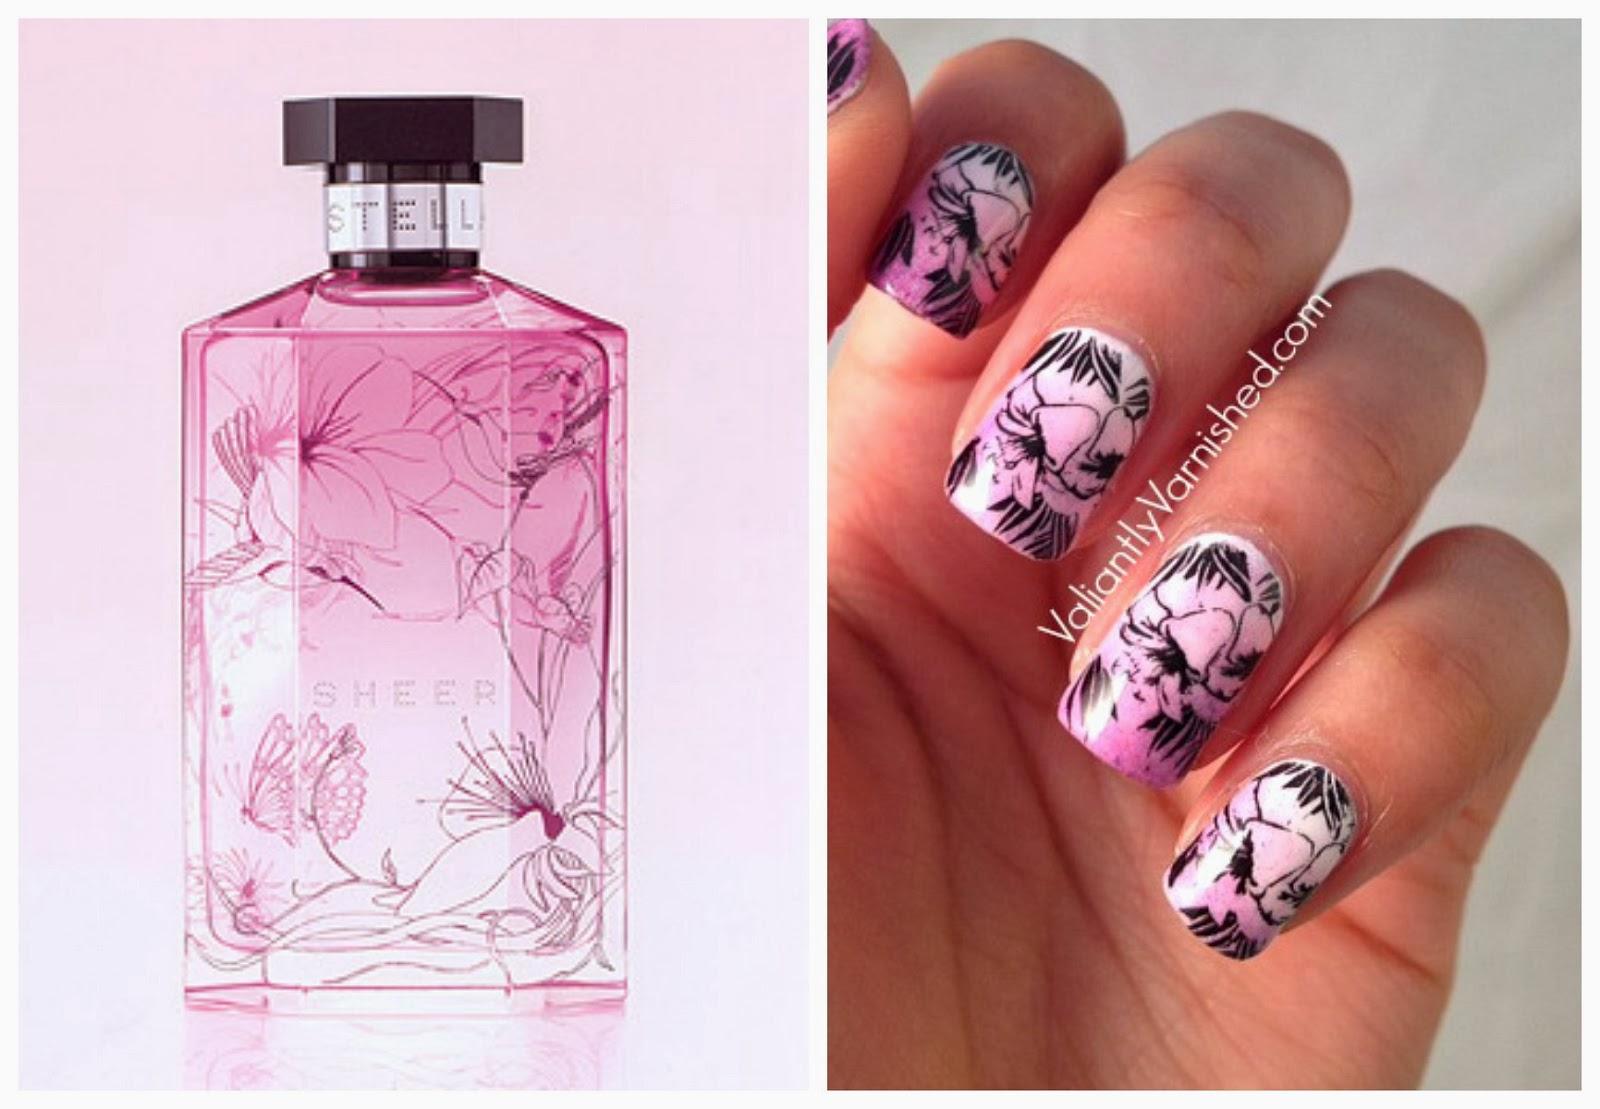 Inspired by Perfume - Stella McCartney Sheer — Valiantly ...